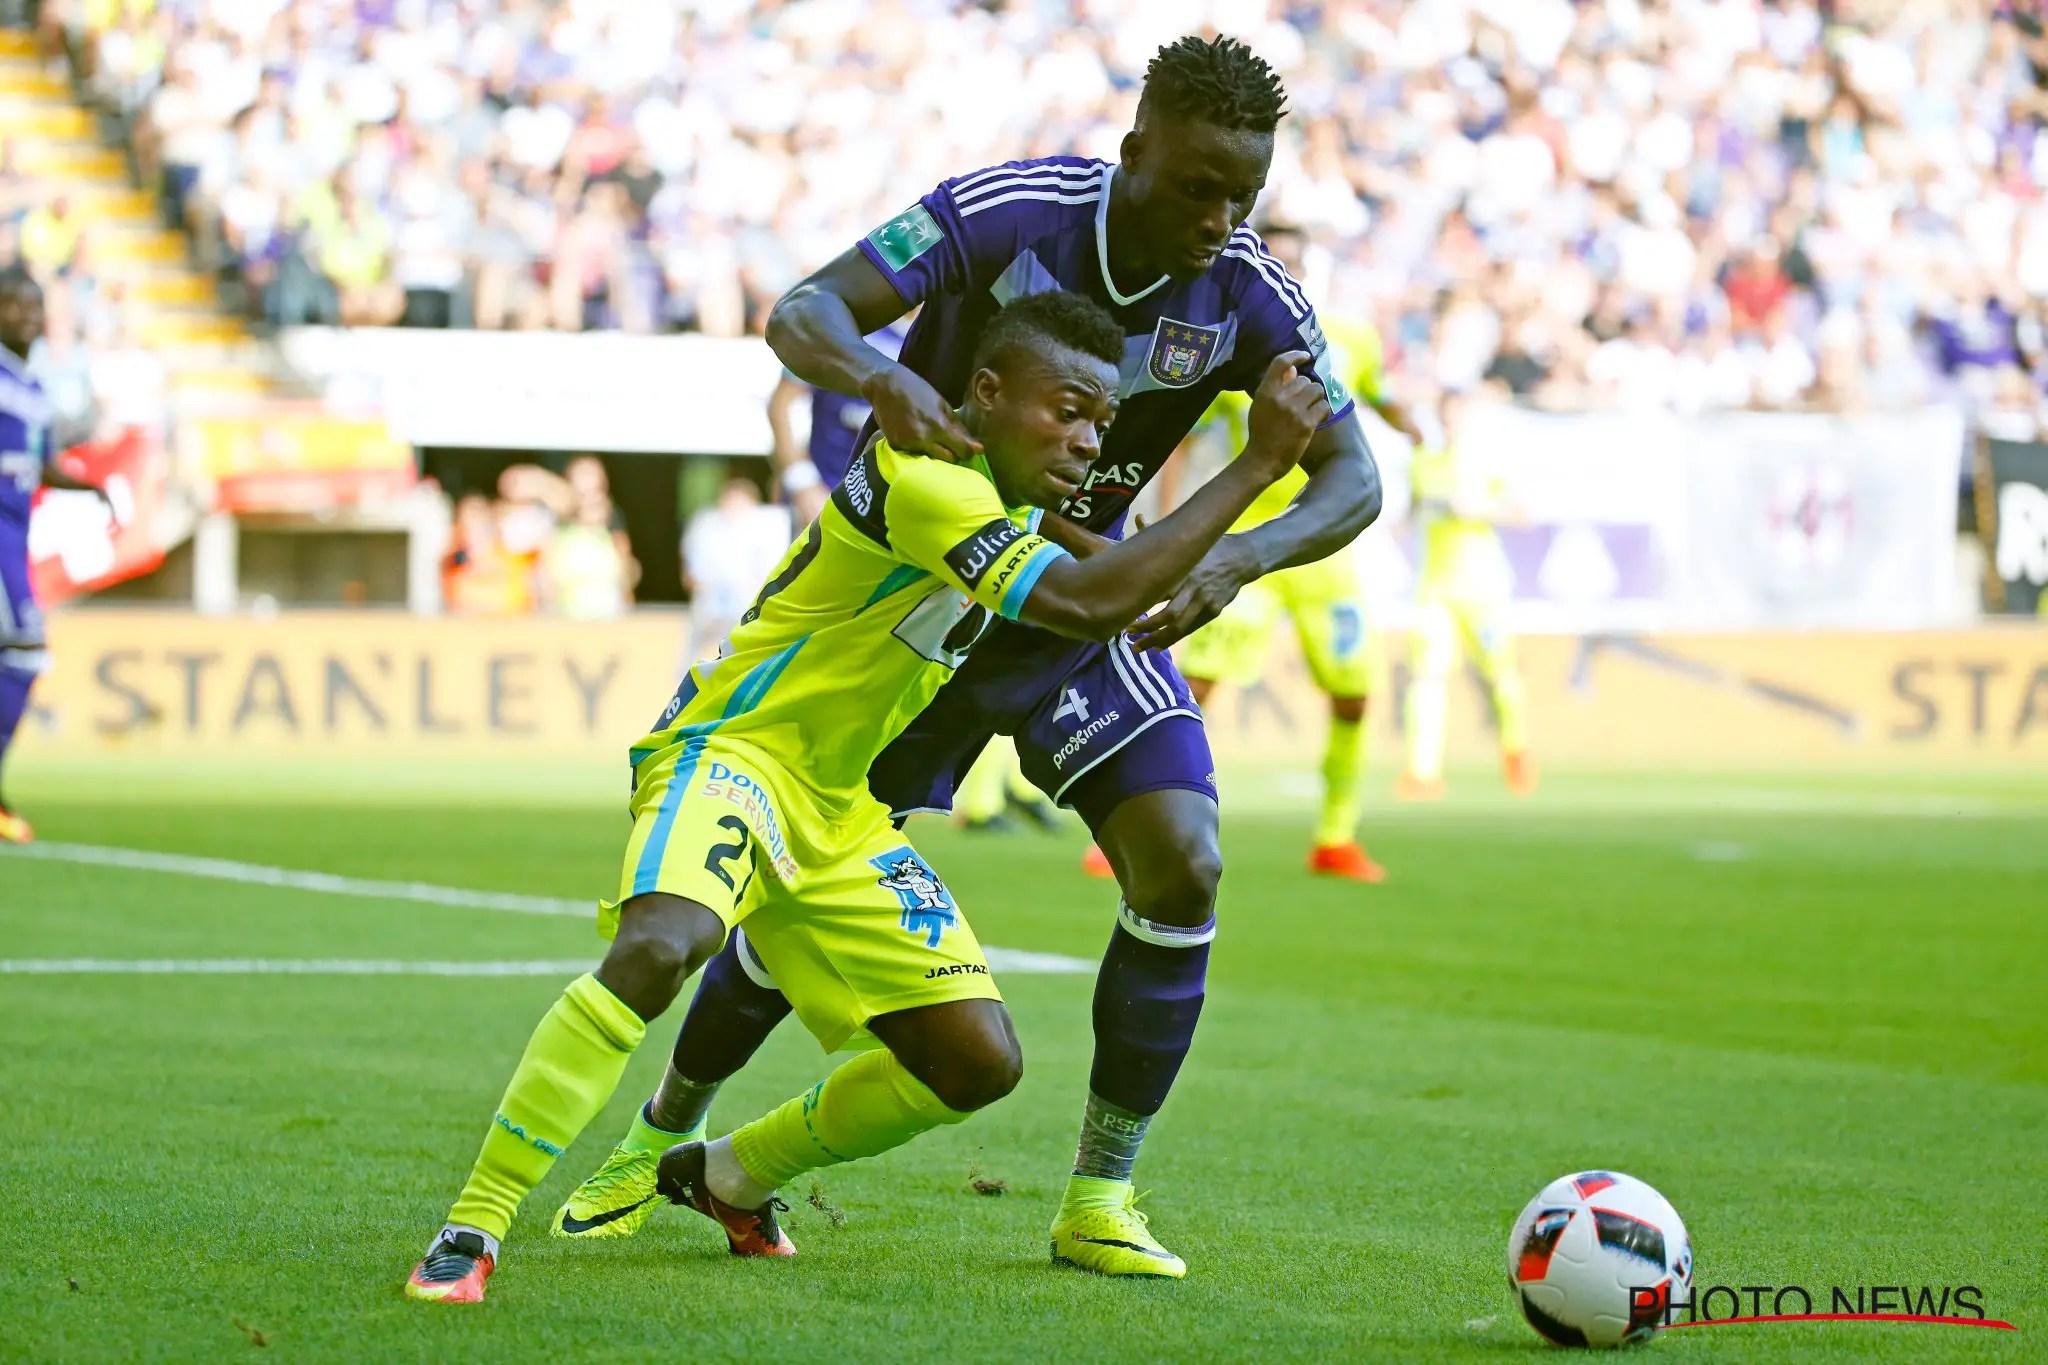 Simon Scores In Gent, Anderlecht Draw; Sadiq Dropped, Emenike Fires Blanks